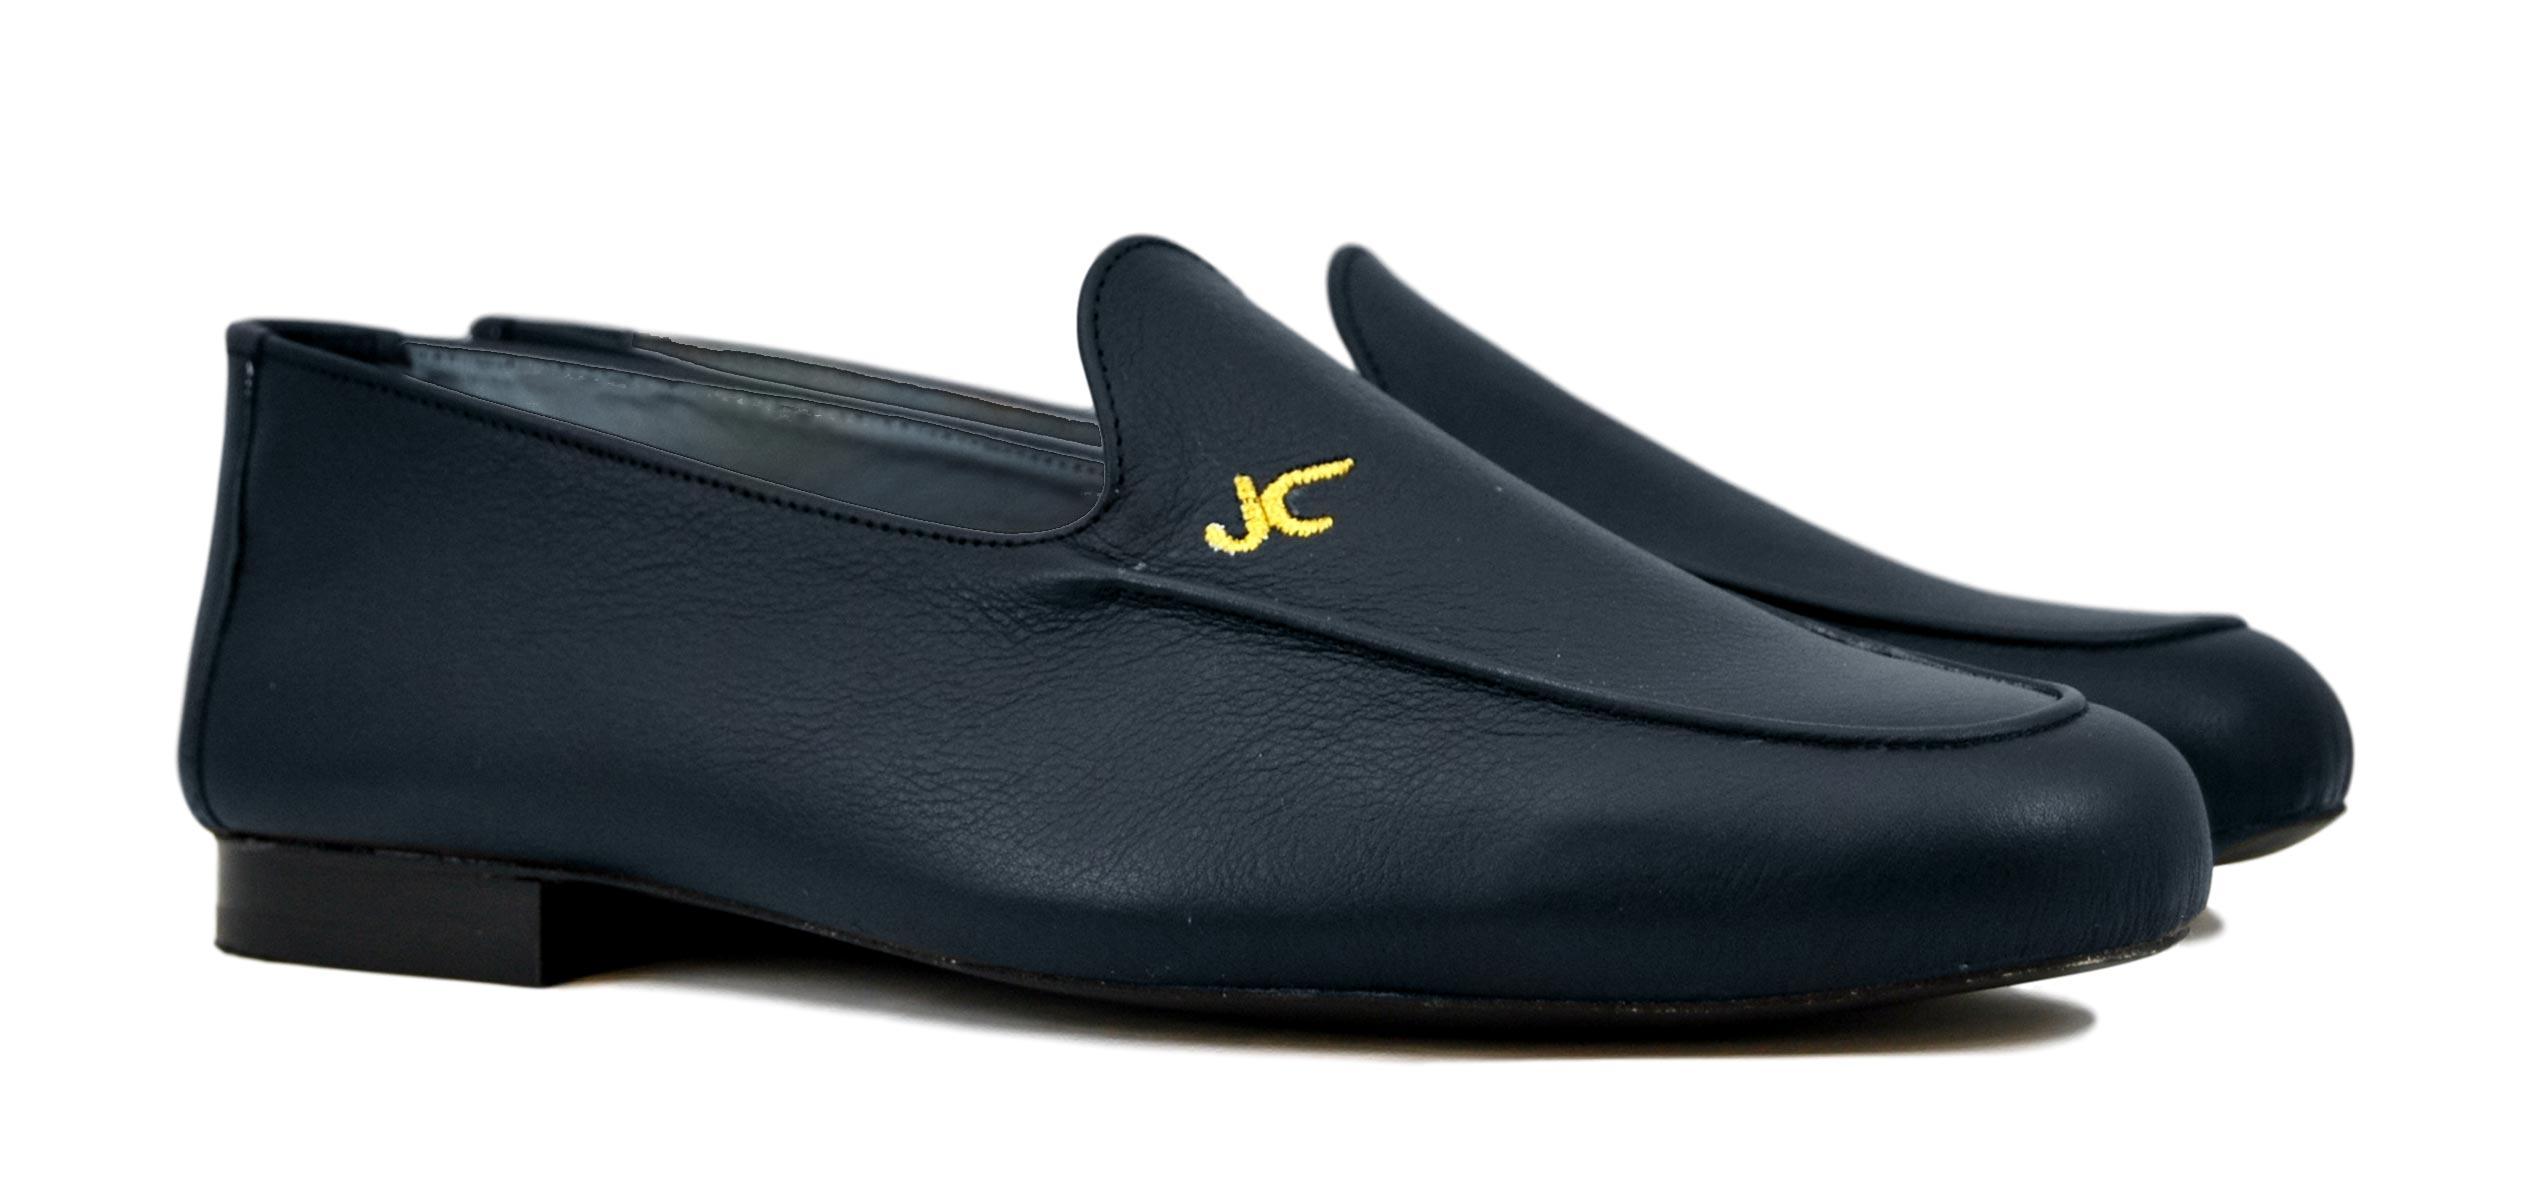 Foto 5 de Zapatos Julio Iglesias Mocasin 528 JC Marino Napa